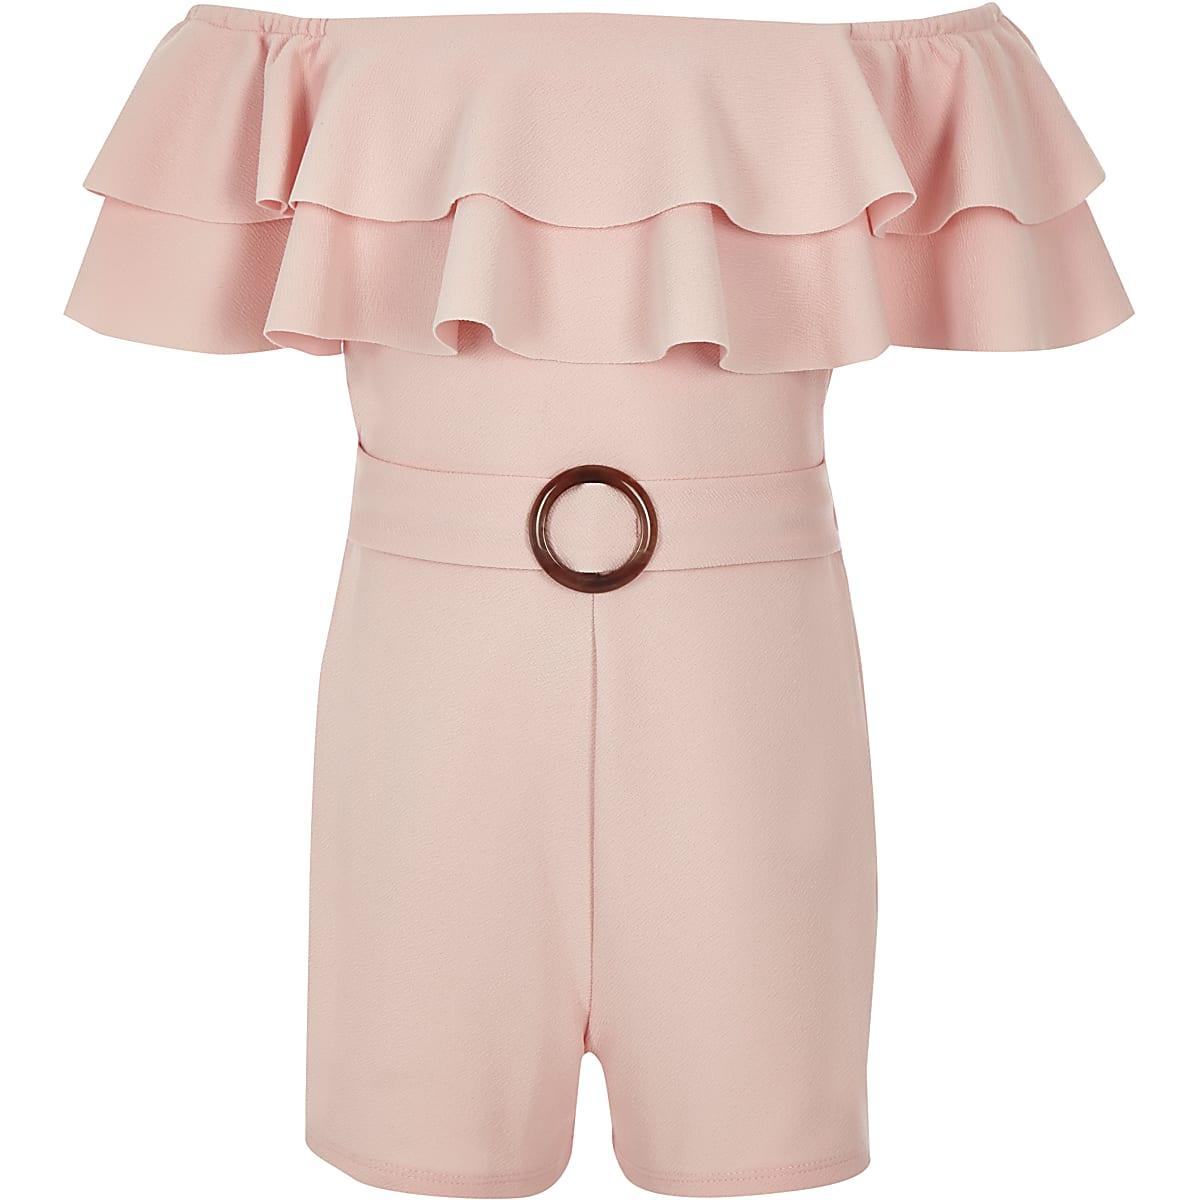 0228092186 Girls light pink bardot frill playsuit - Playsuits - Playsuits   Jumpsuits  - girls